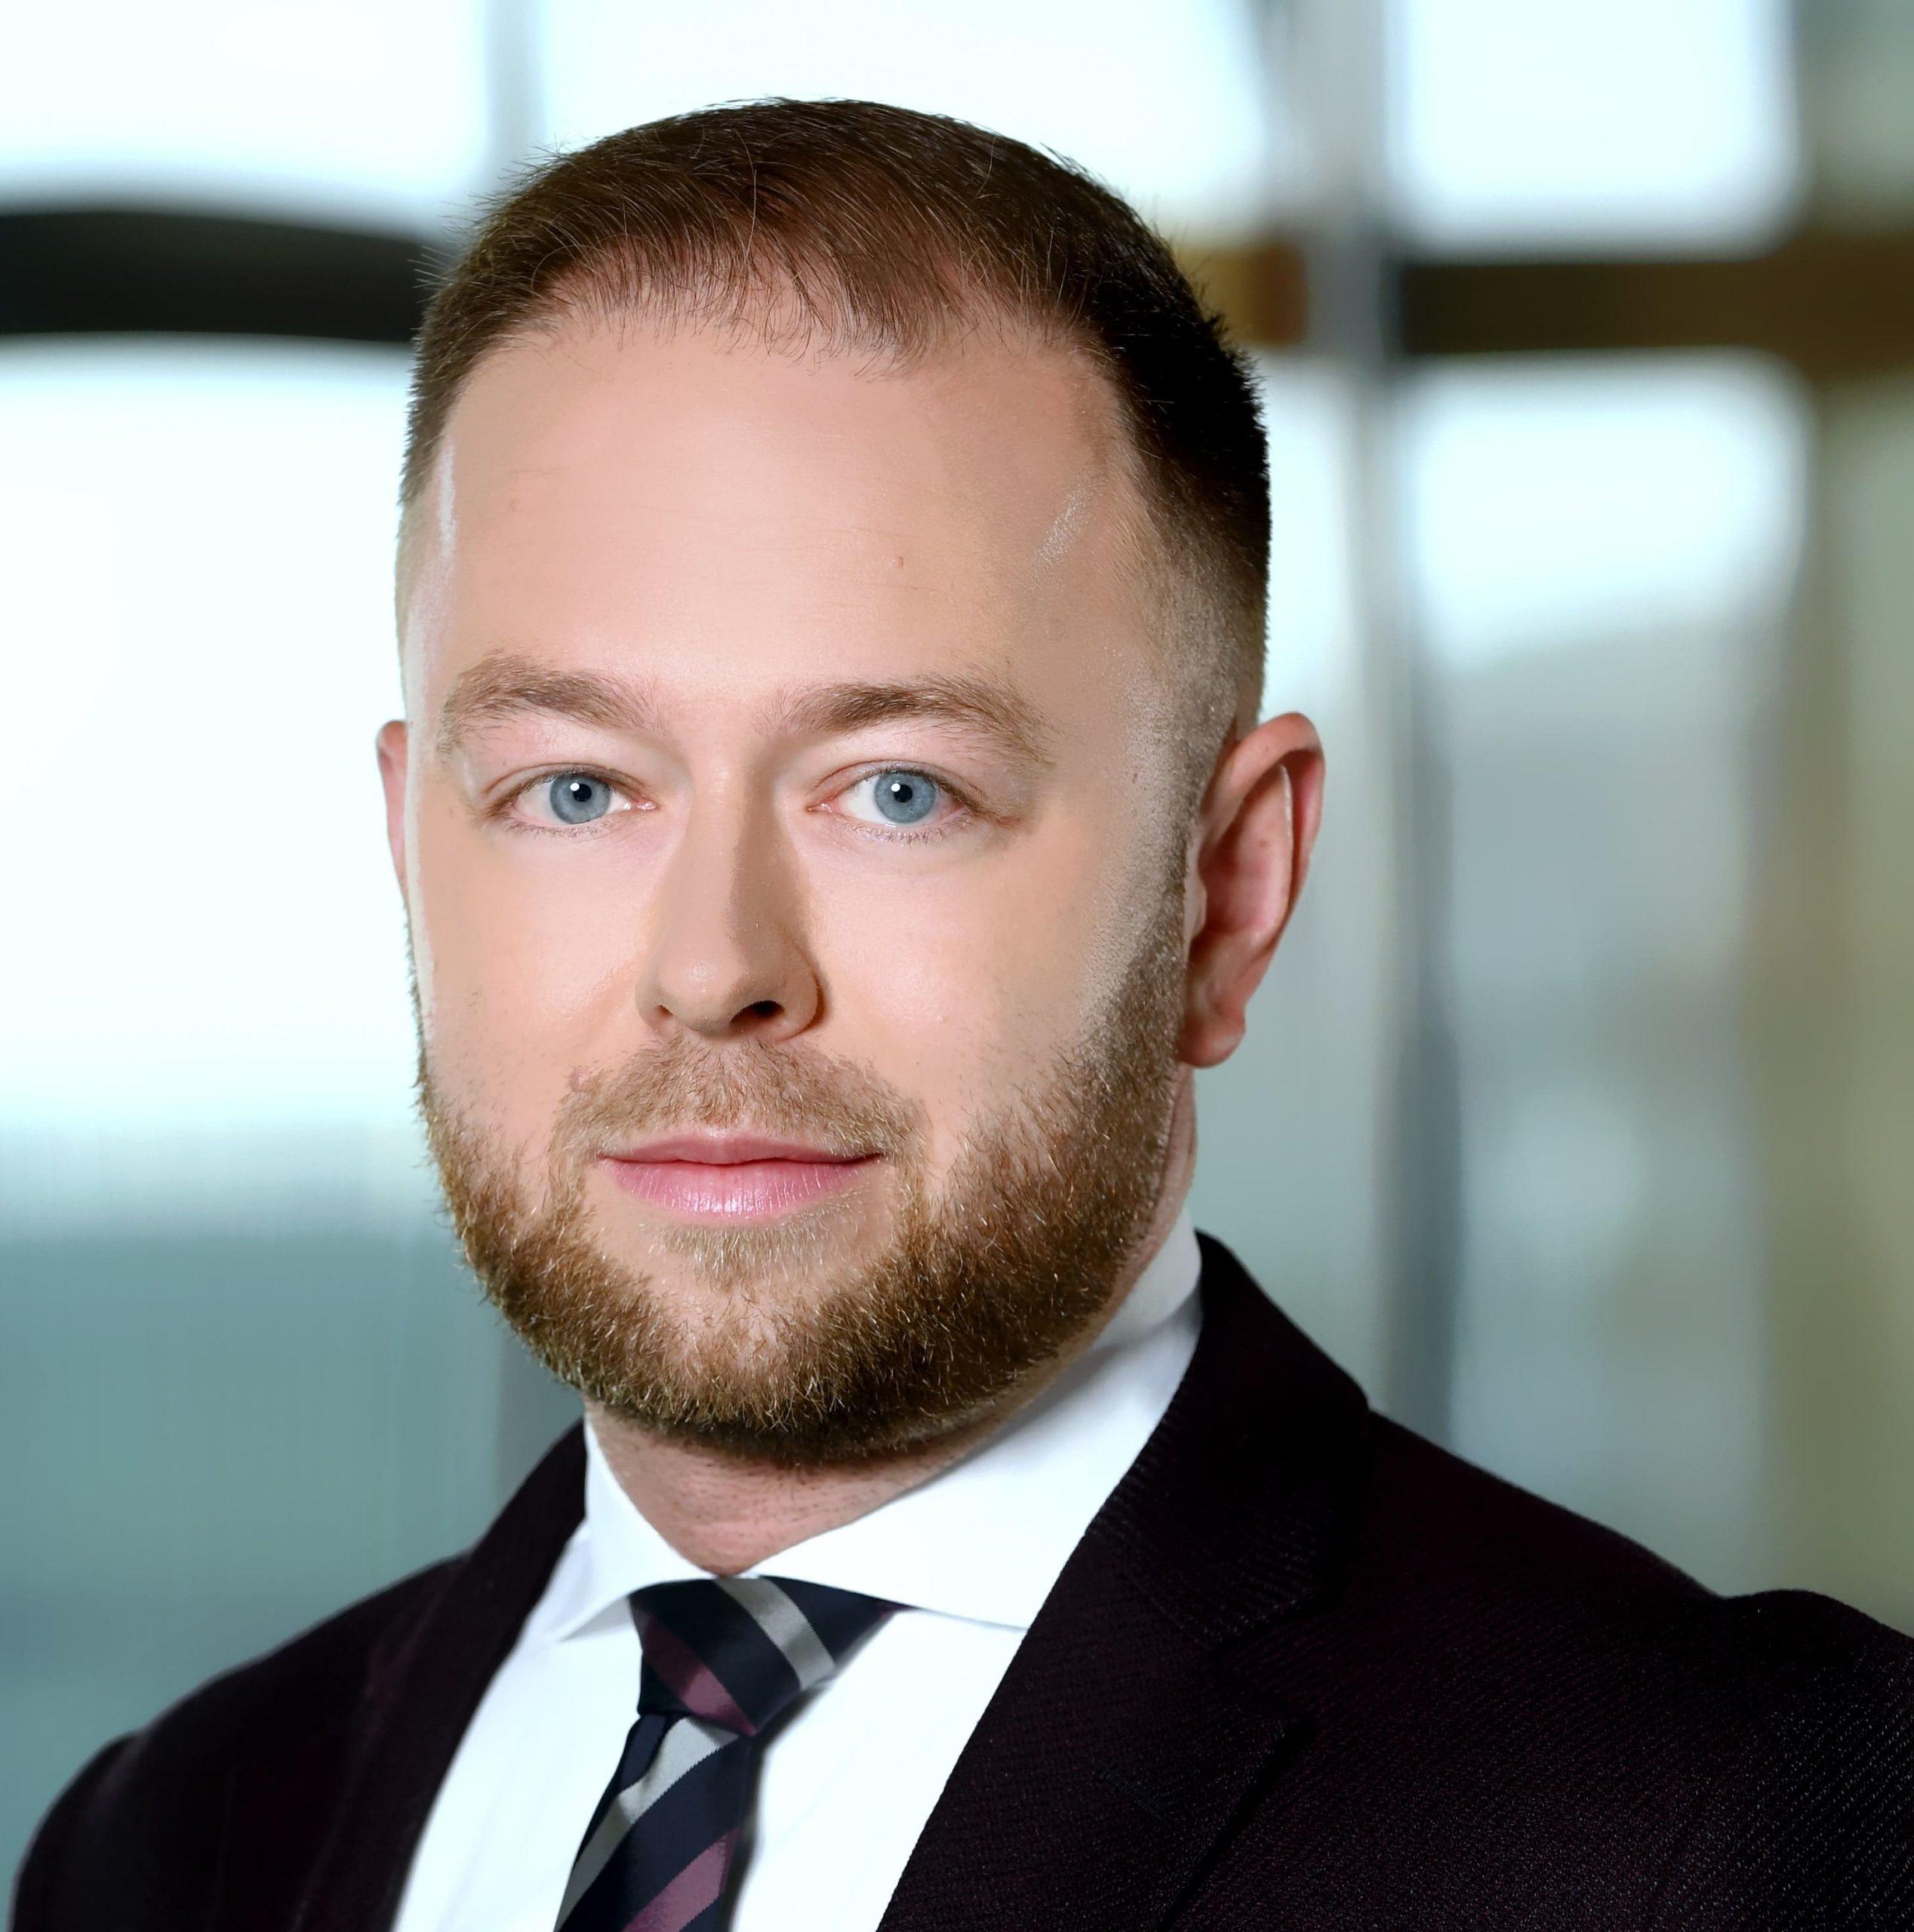 Paweł Chyb, Ph.D.